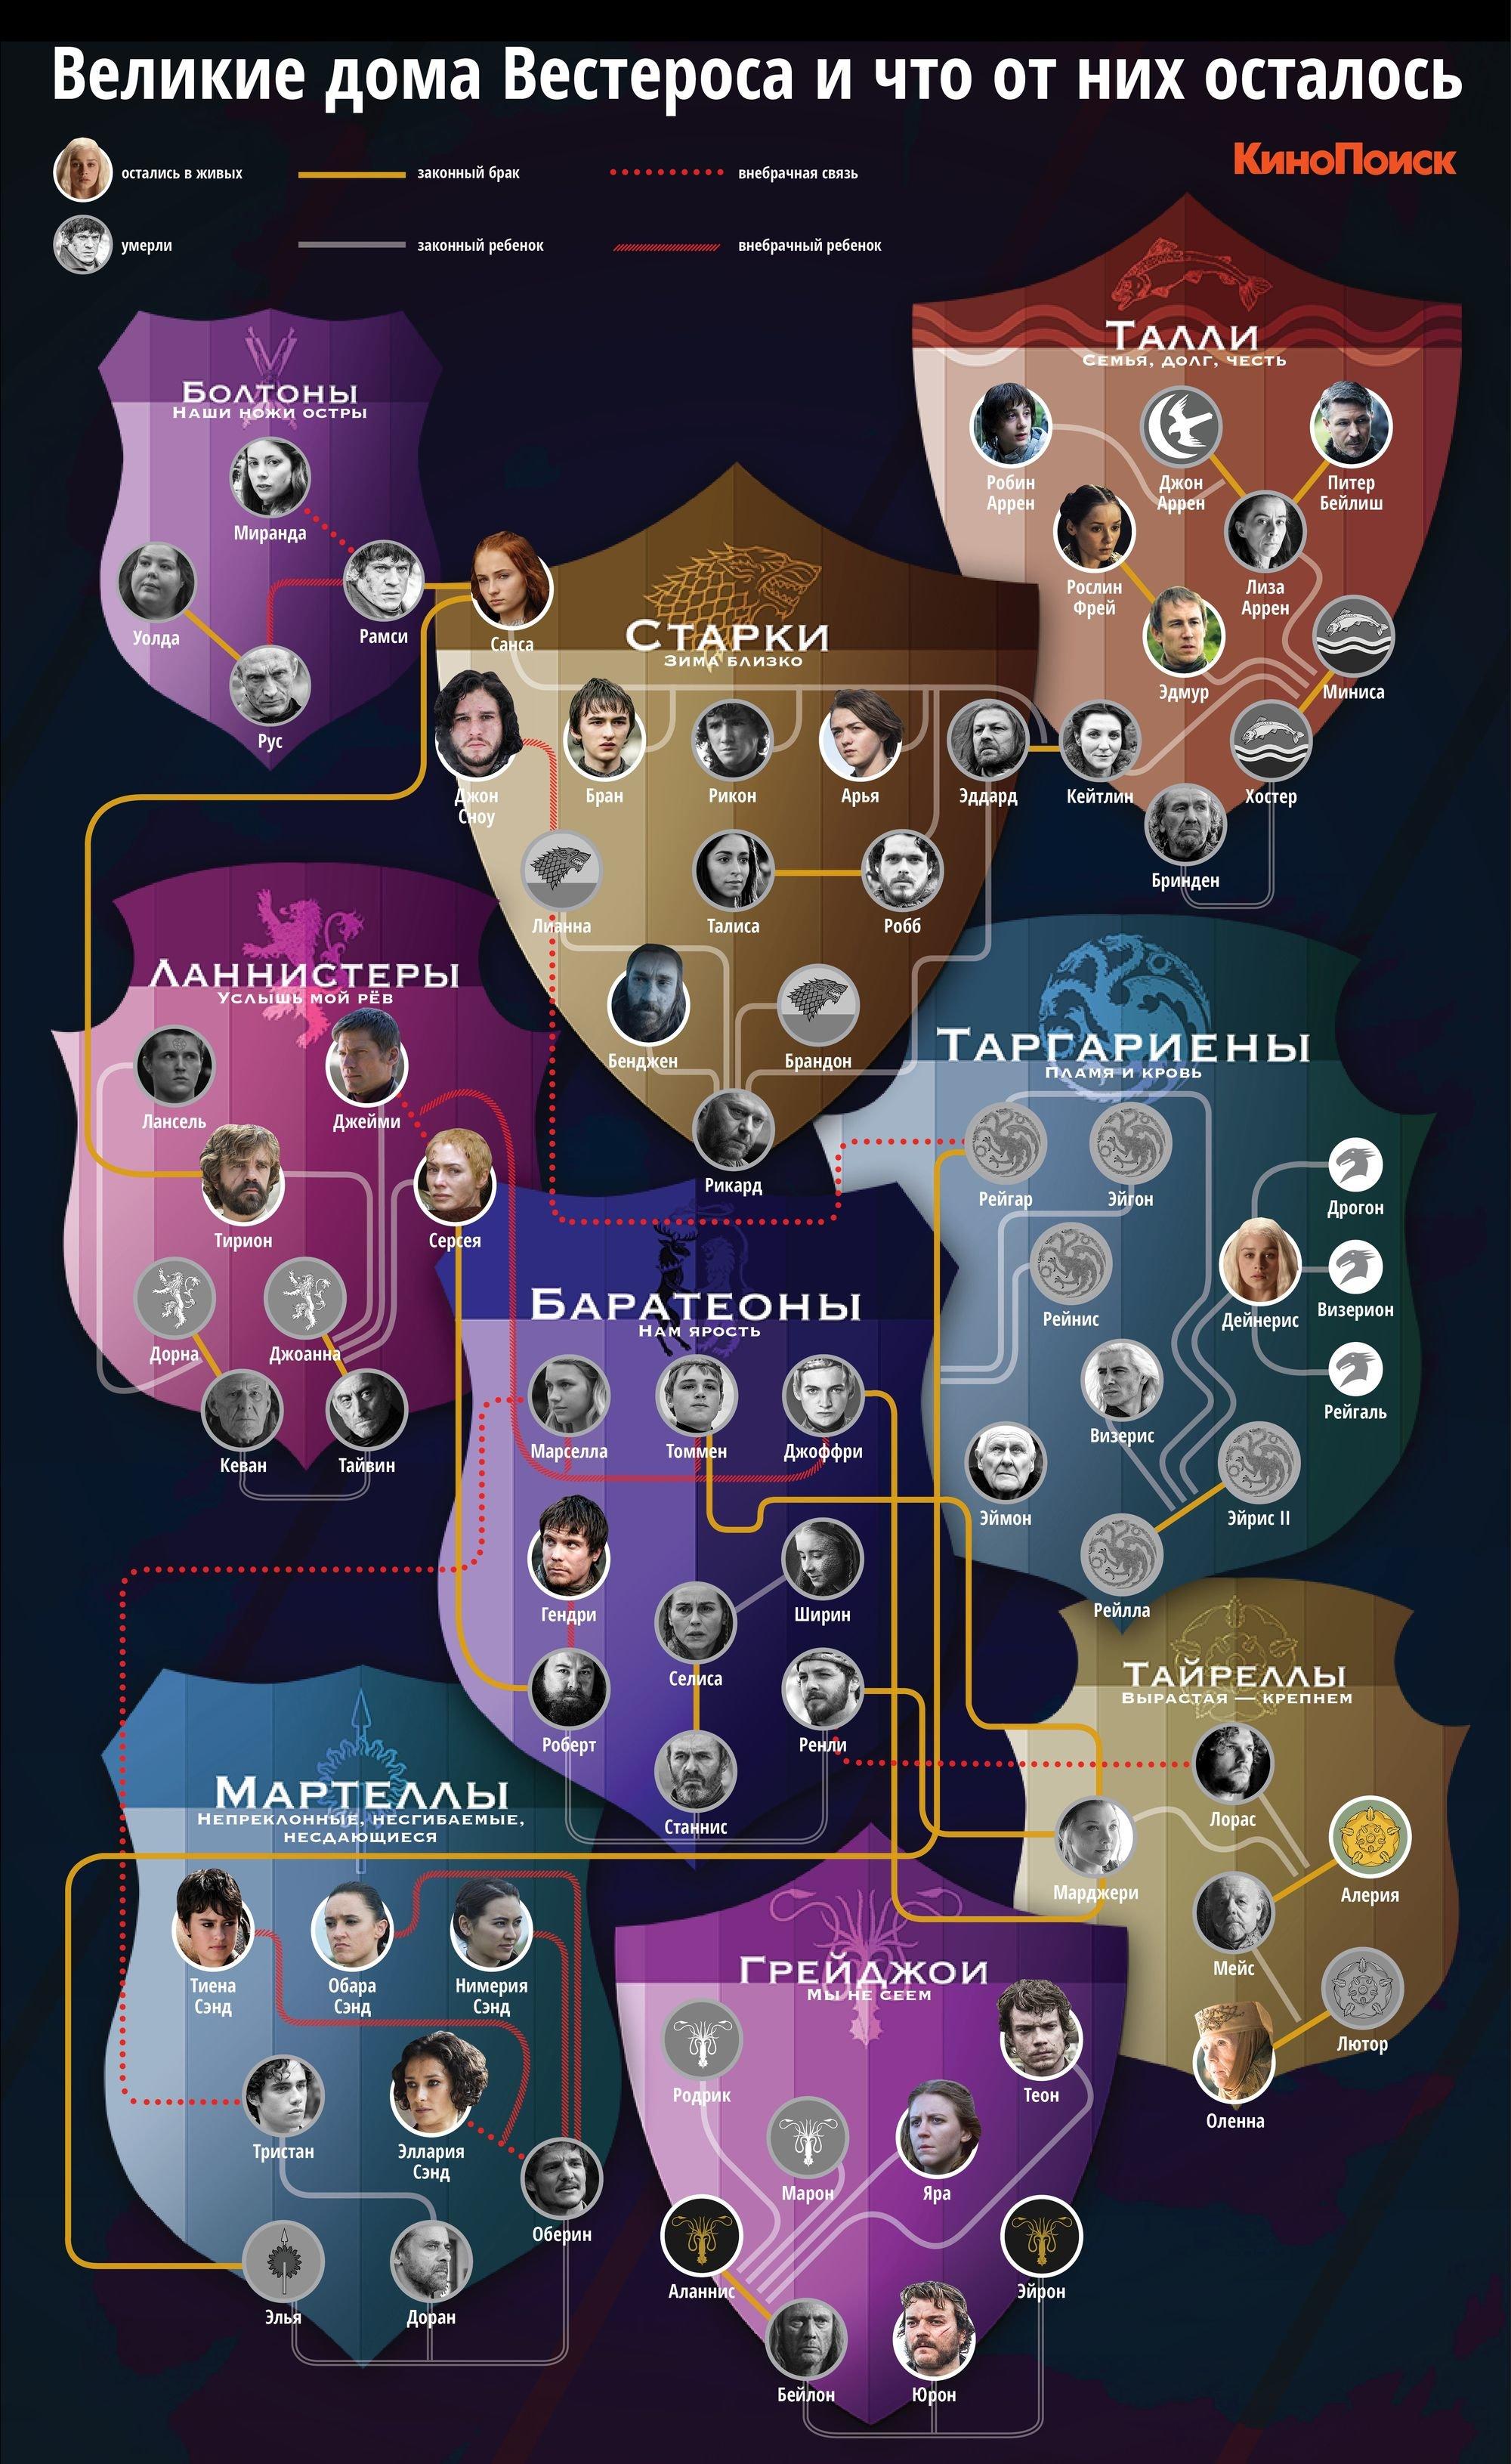 Великие дома Вестероса: родословная семи королевств | картинка 269223